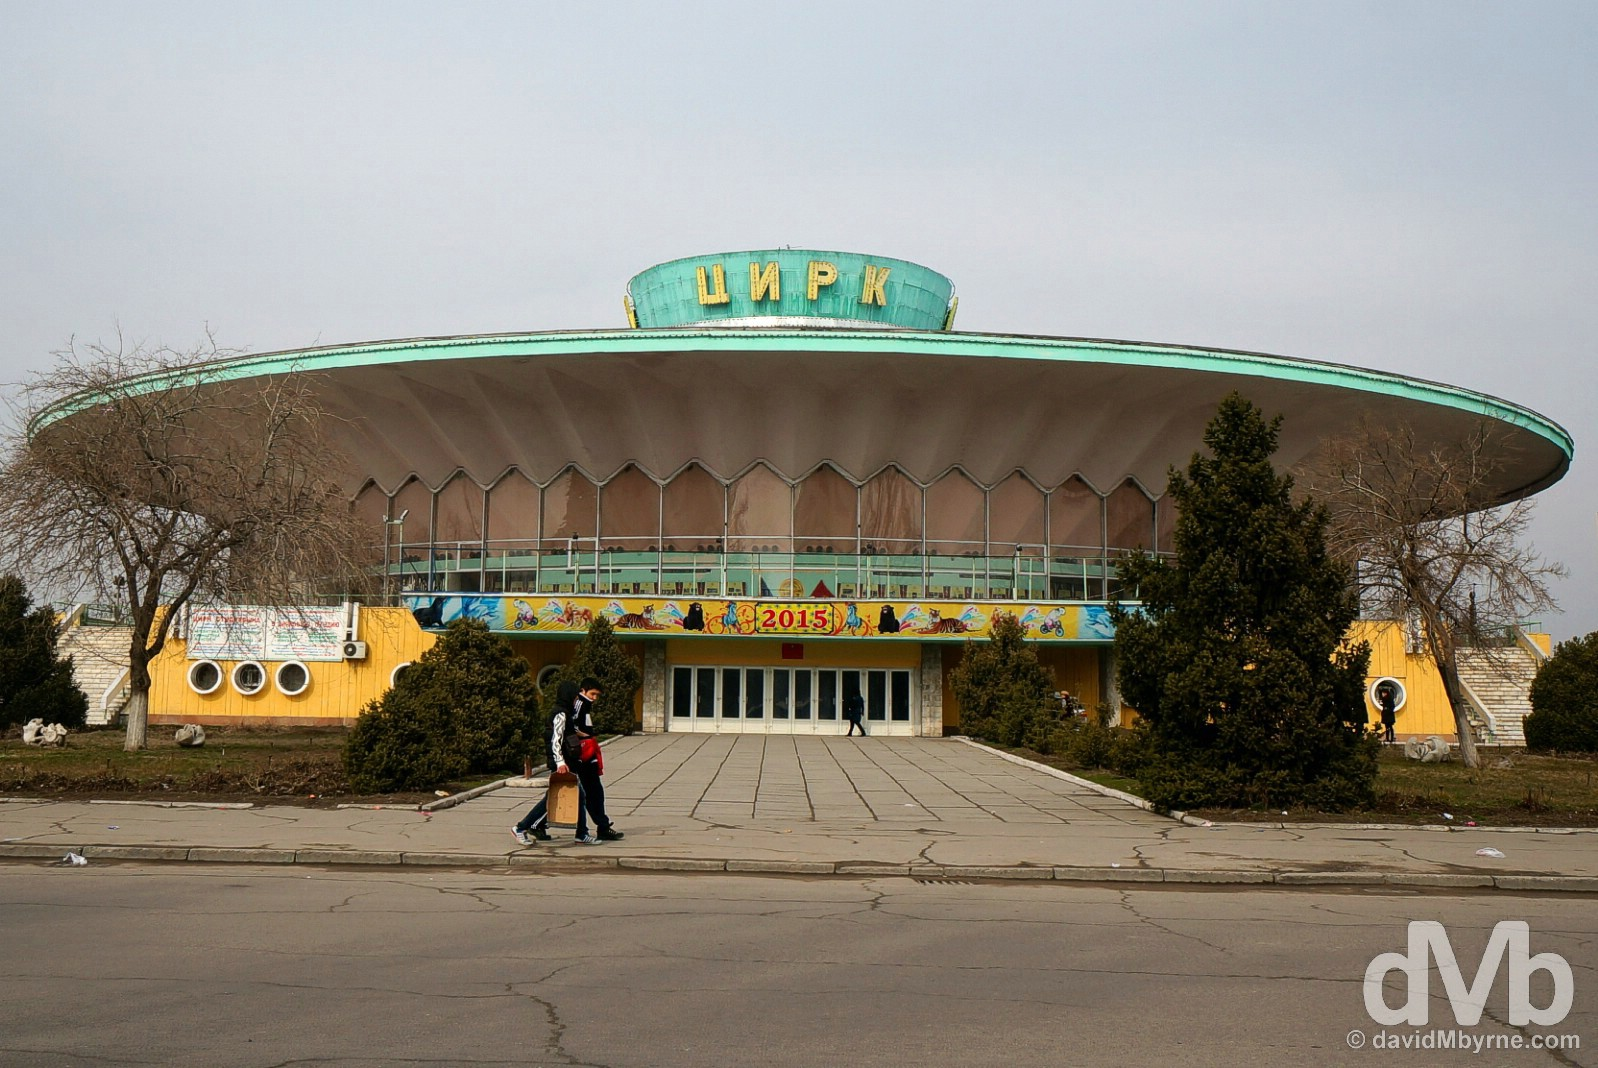 The Circus building in Bishkek, Kyrgyzstan. February 23, 2015.